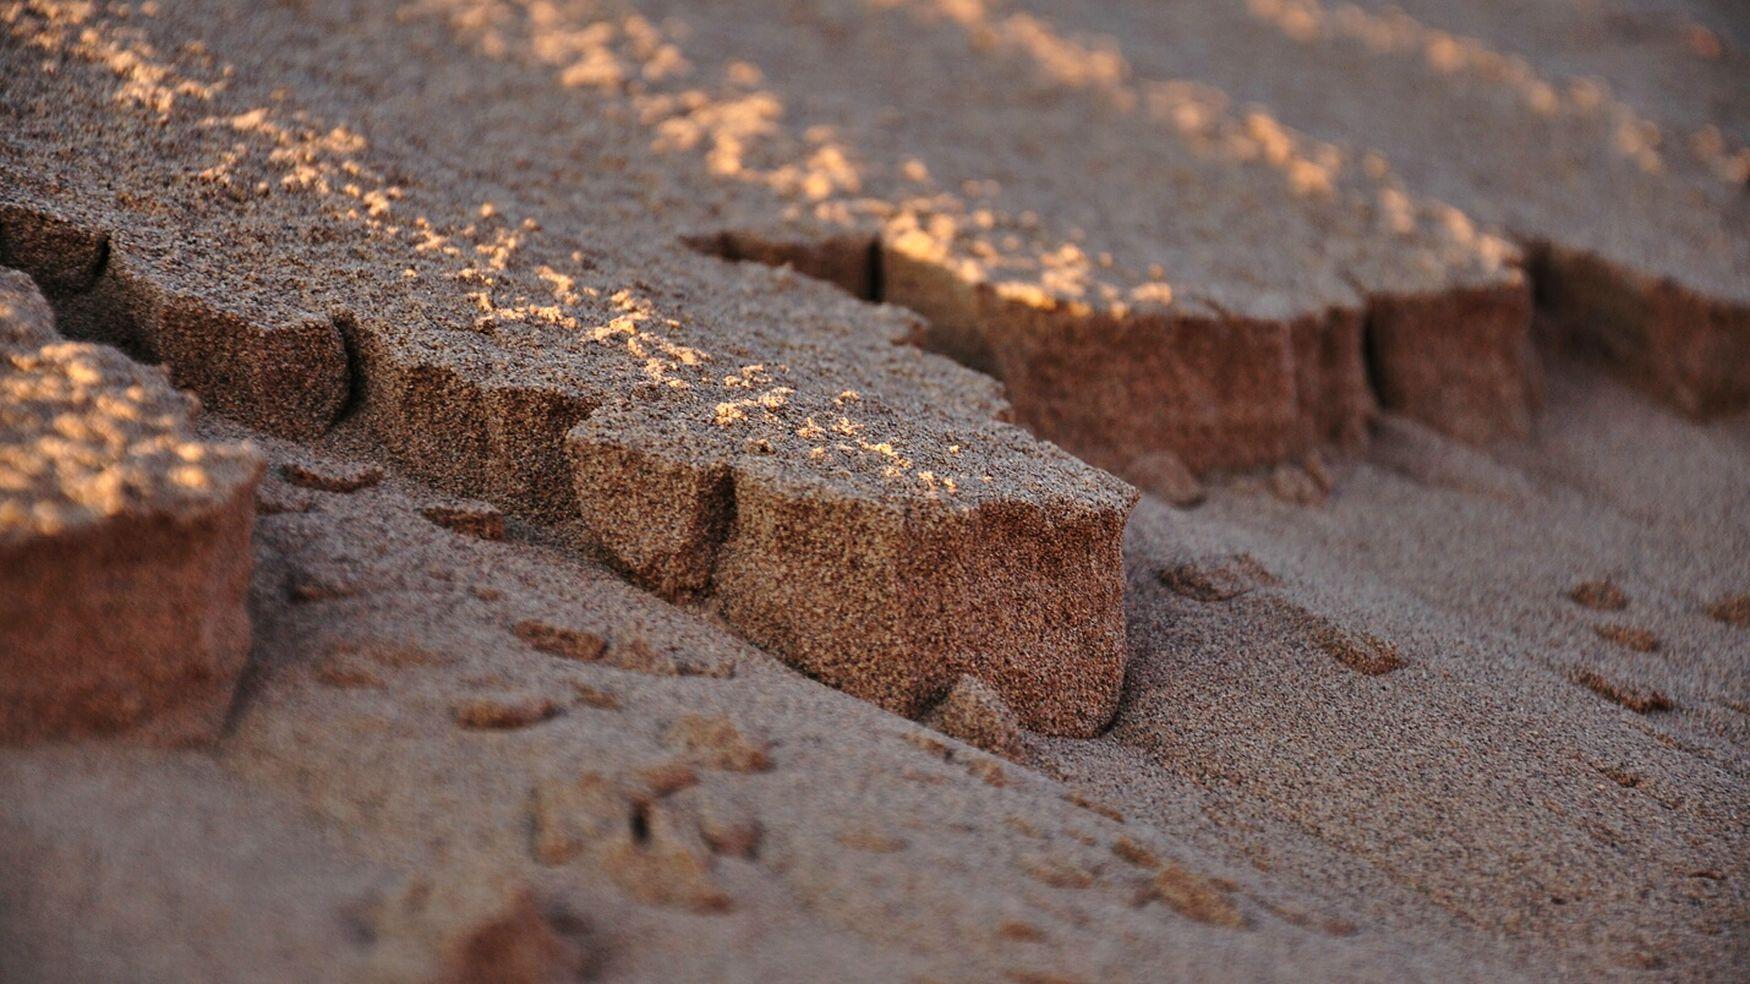 Deserts Around The World Iran Hemmatabad Salt Desert Sun Nature Nikon Photography Macro Photography EyeEm Travel